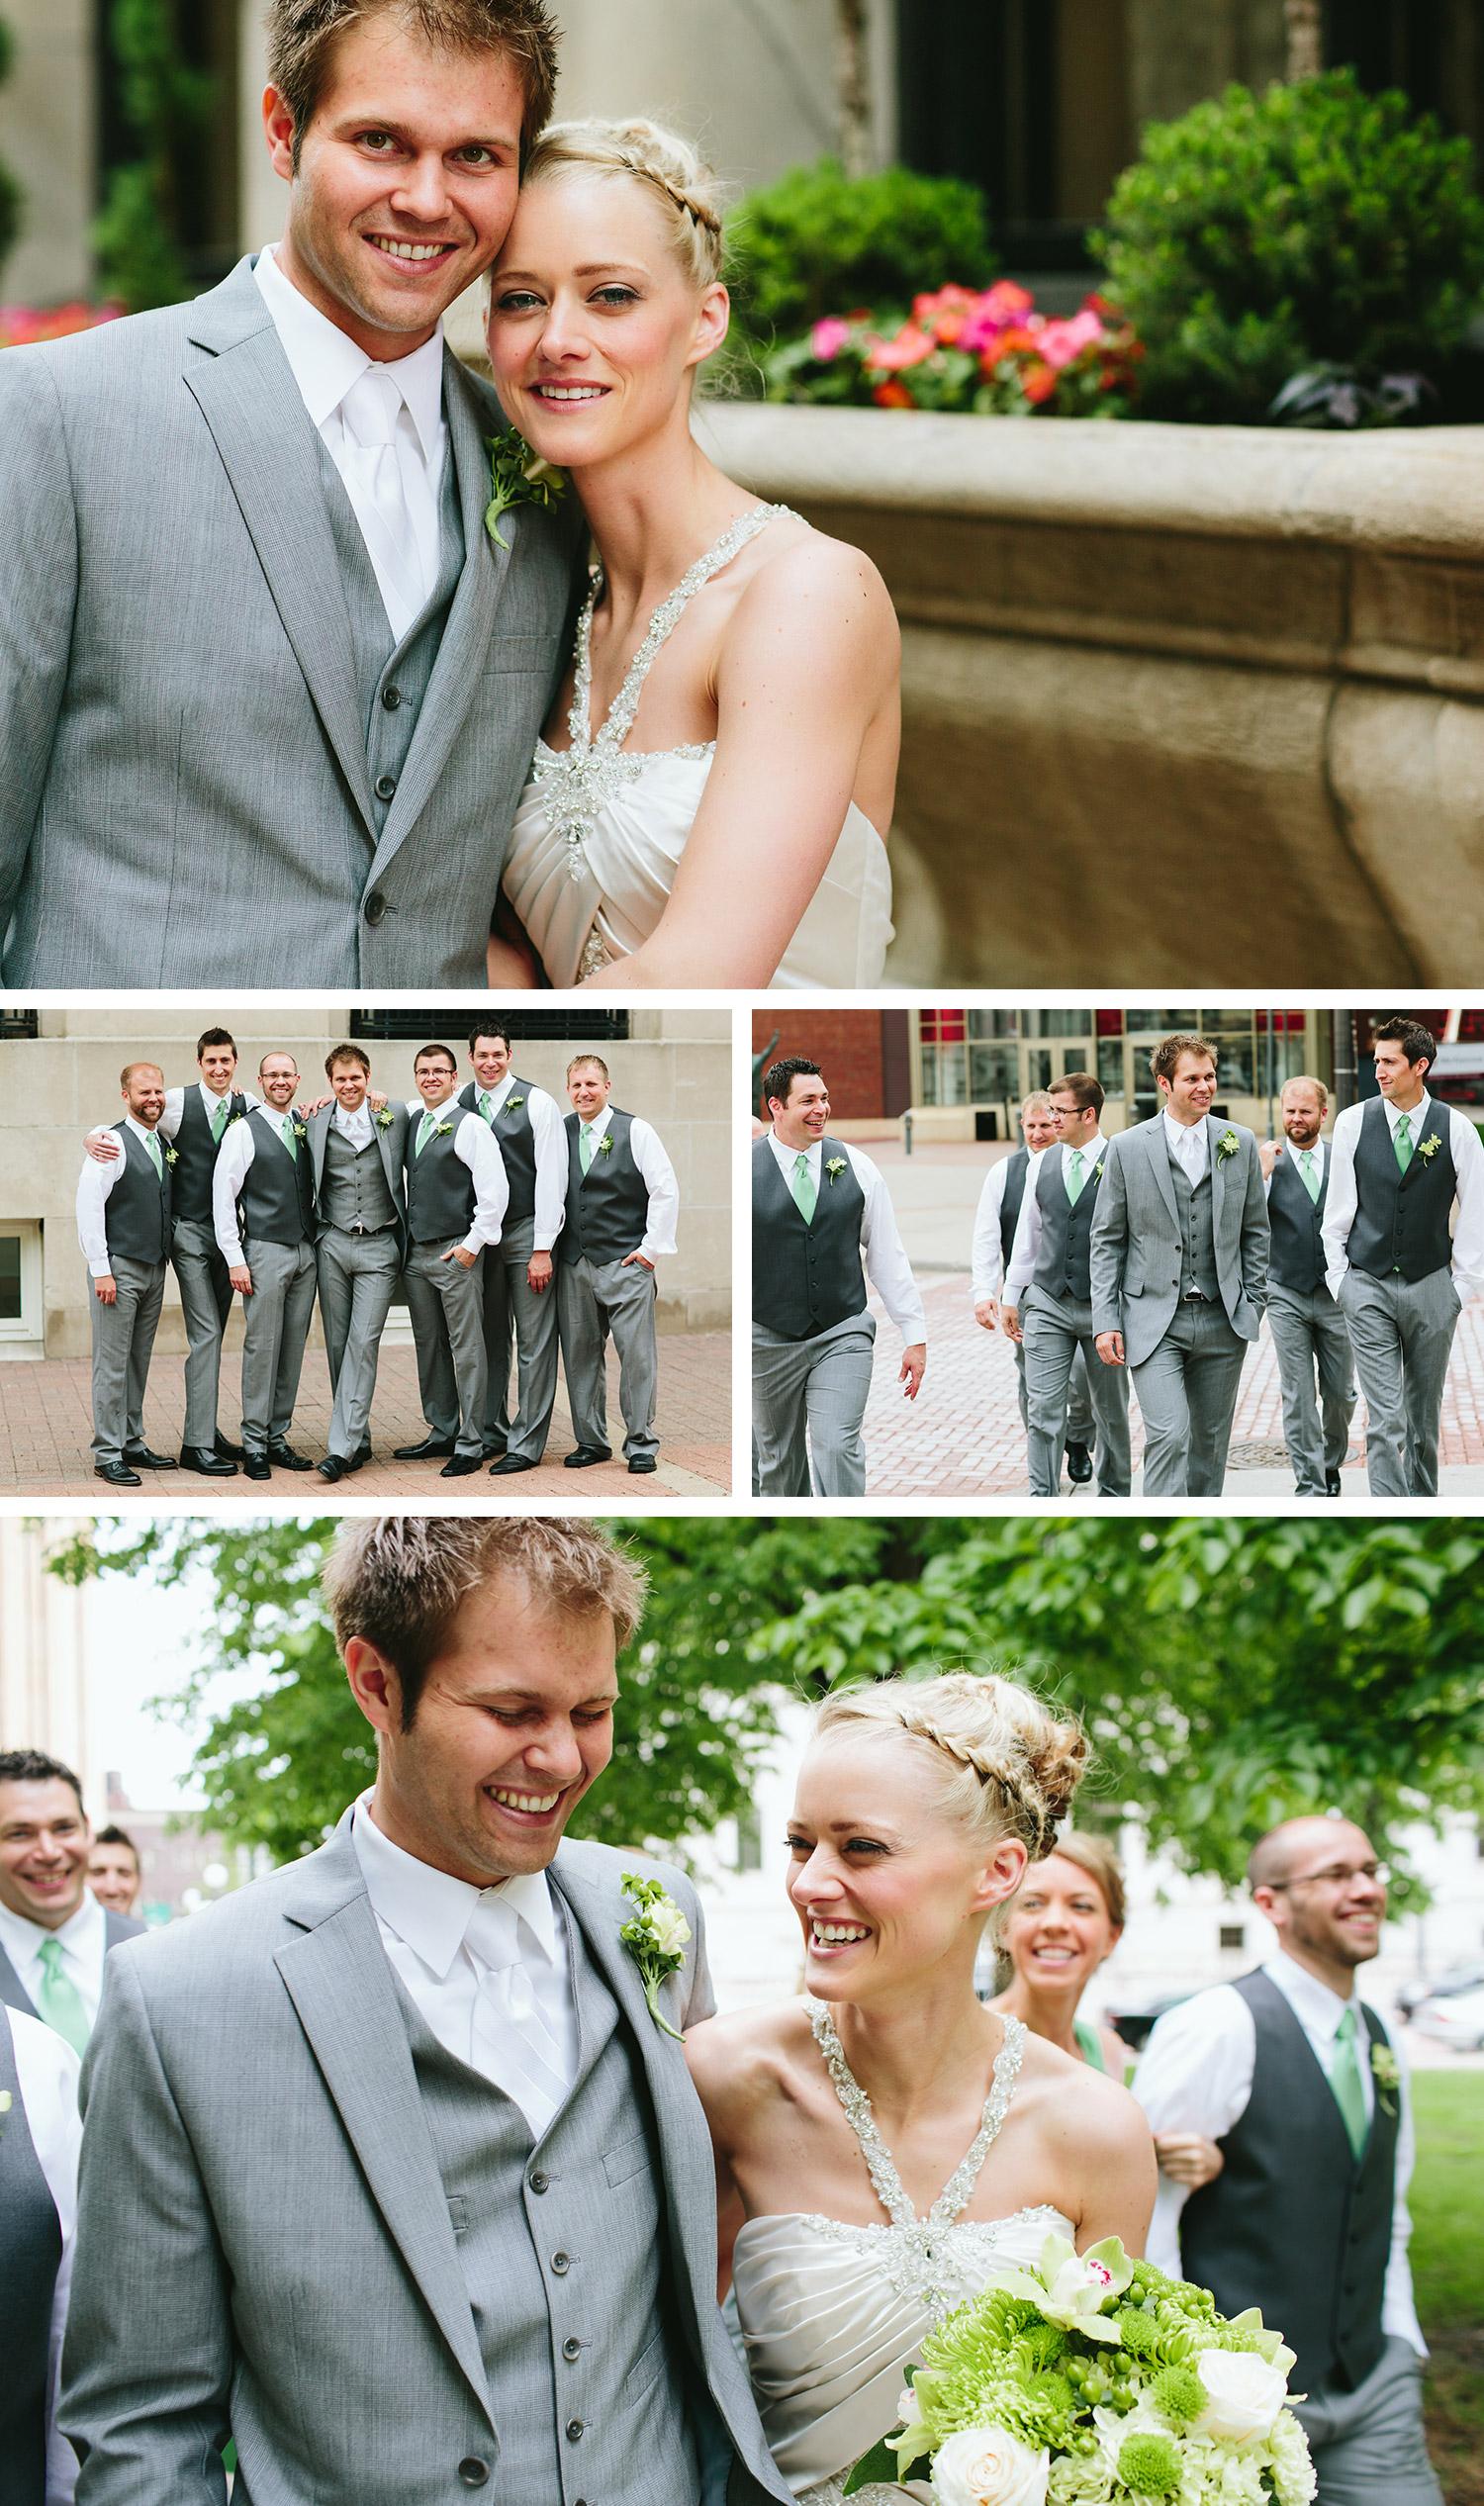 06_Saint_Paul_Hotel_Landmark_Center_wedding.jpg